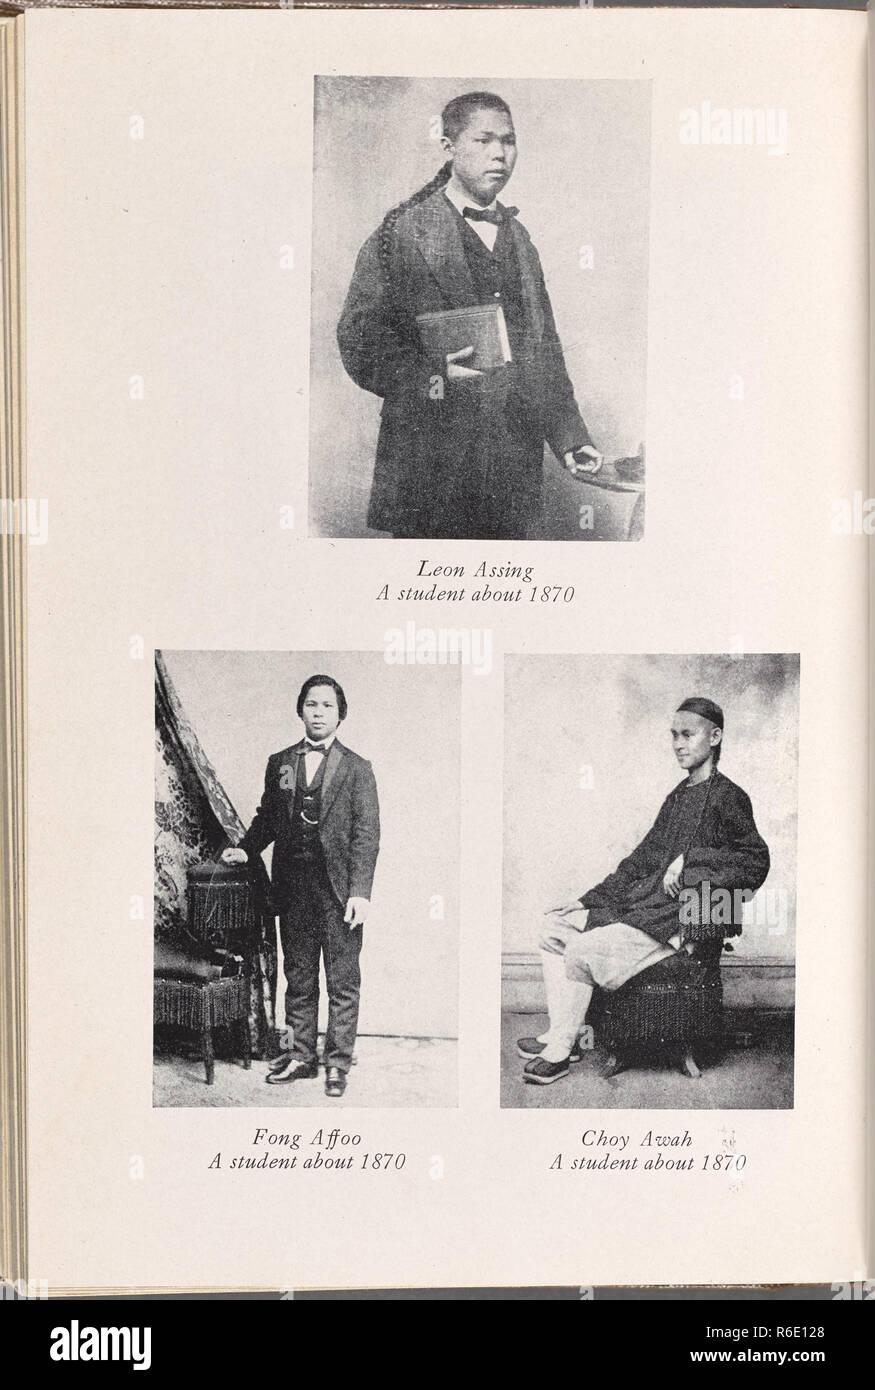 victorian era portrait photograph - Stock Image